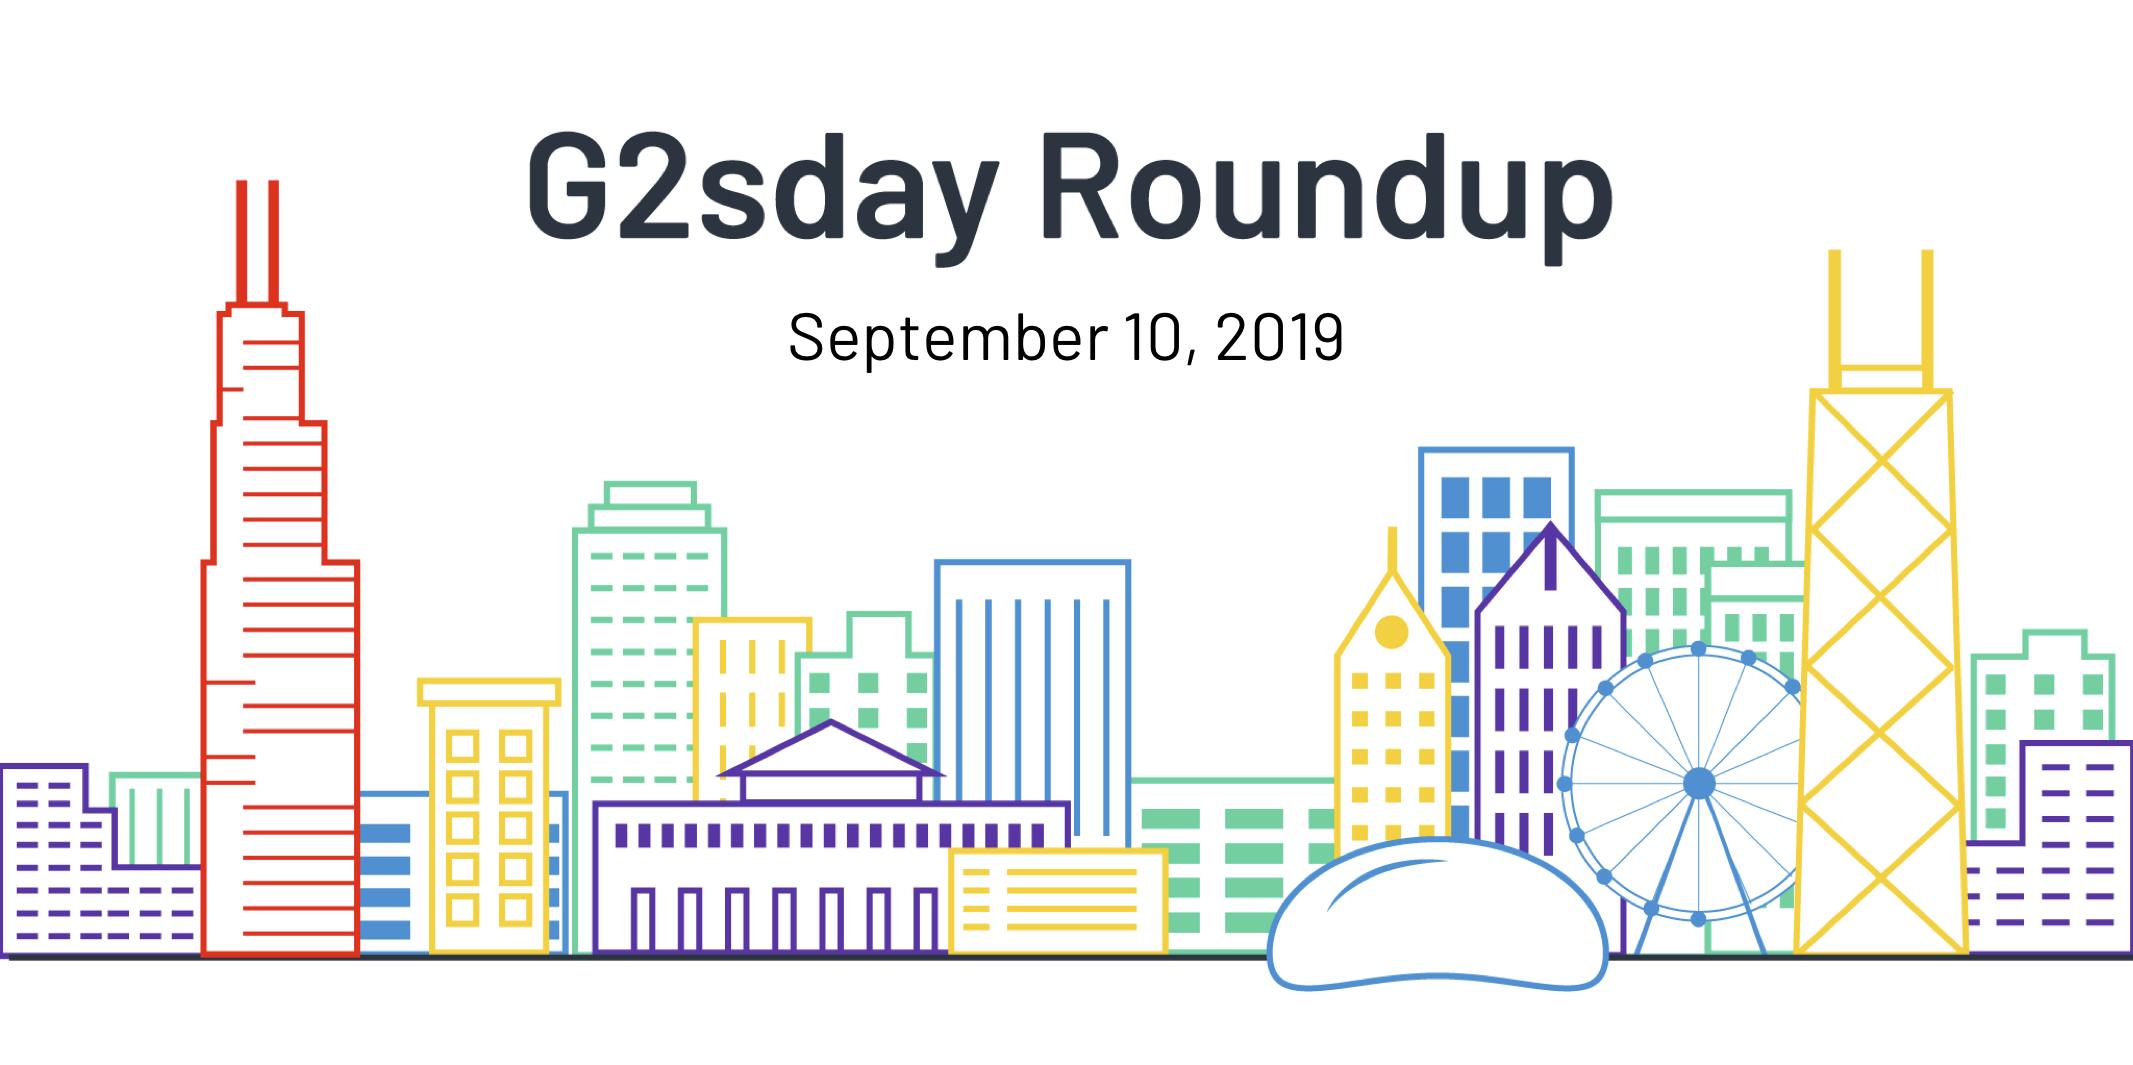 G2sday Roundup 9-11-2019